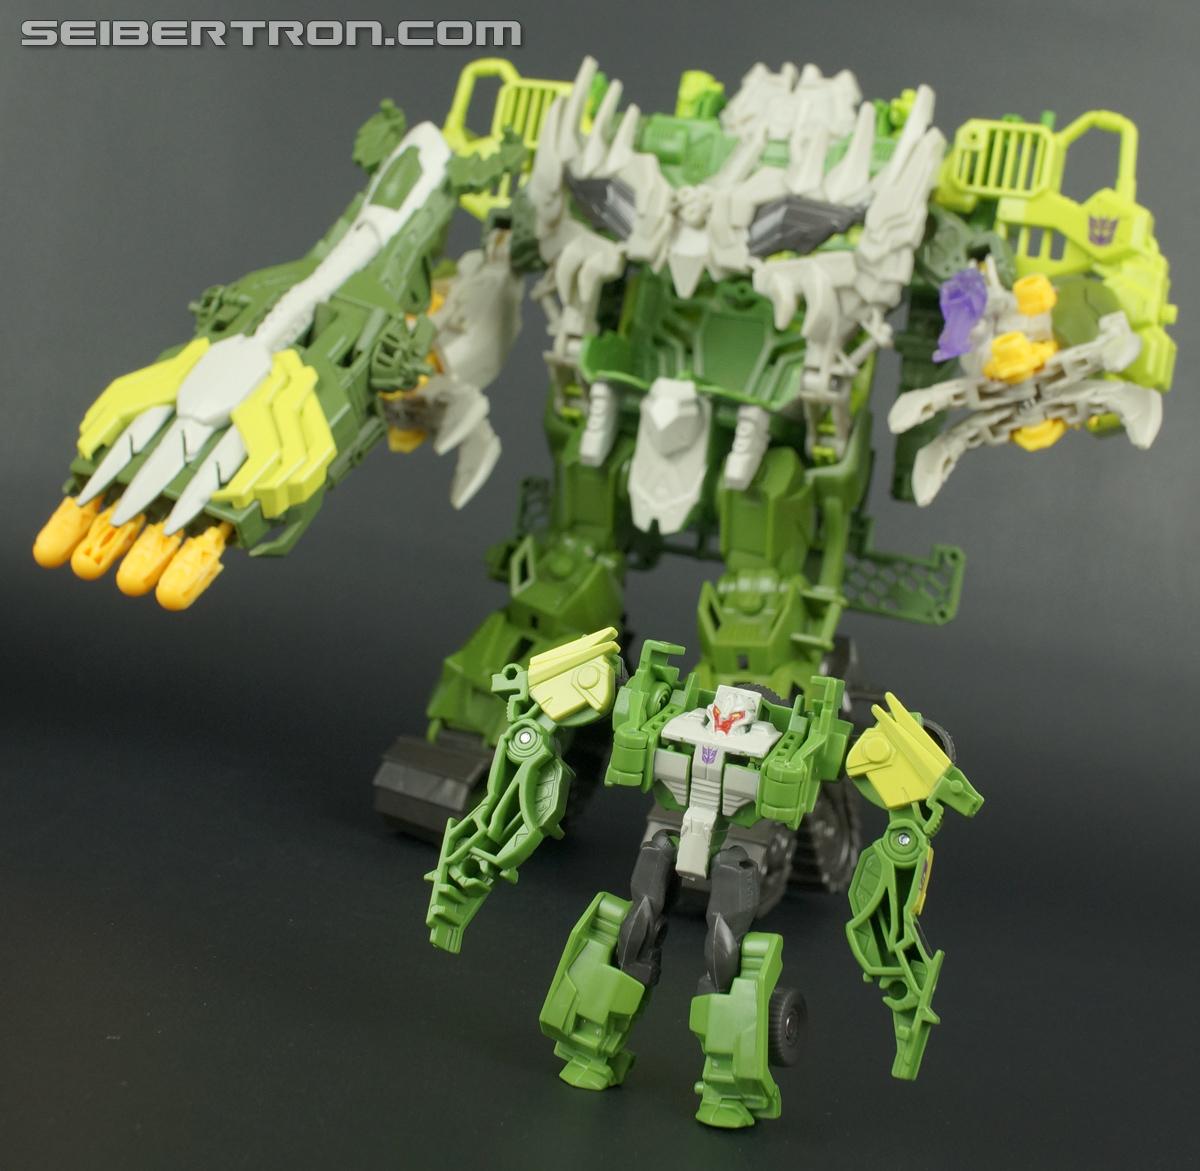 Transformers Prime Beast Hunters Cyberverse Breakdown (Apex Hunter Armor) (Image #6 of 96)